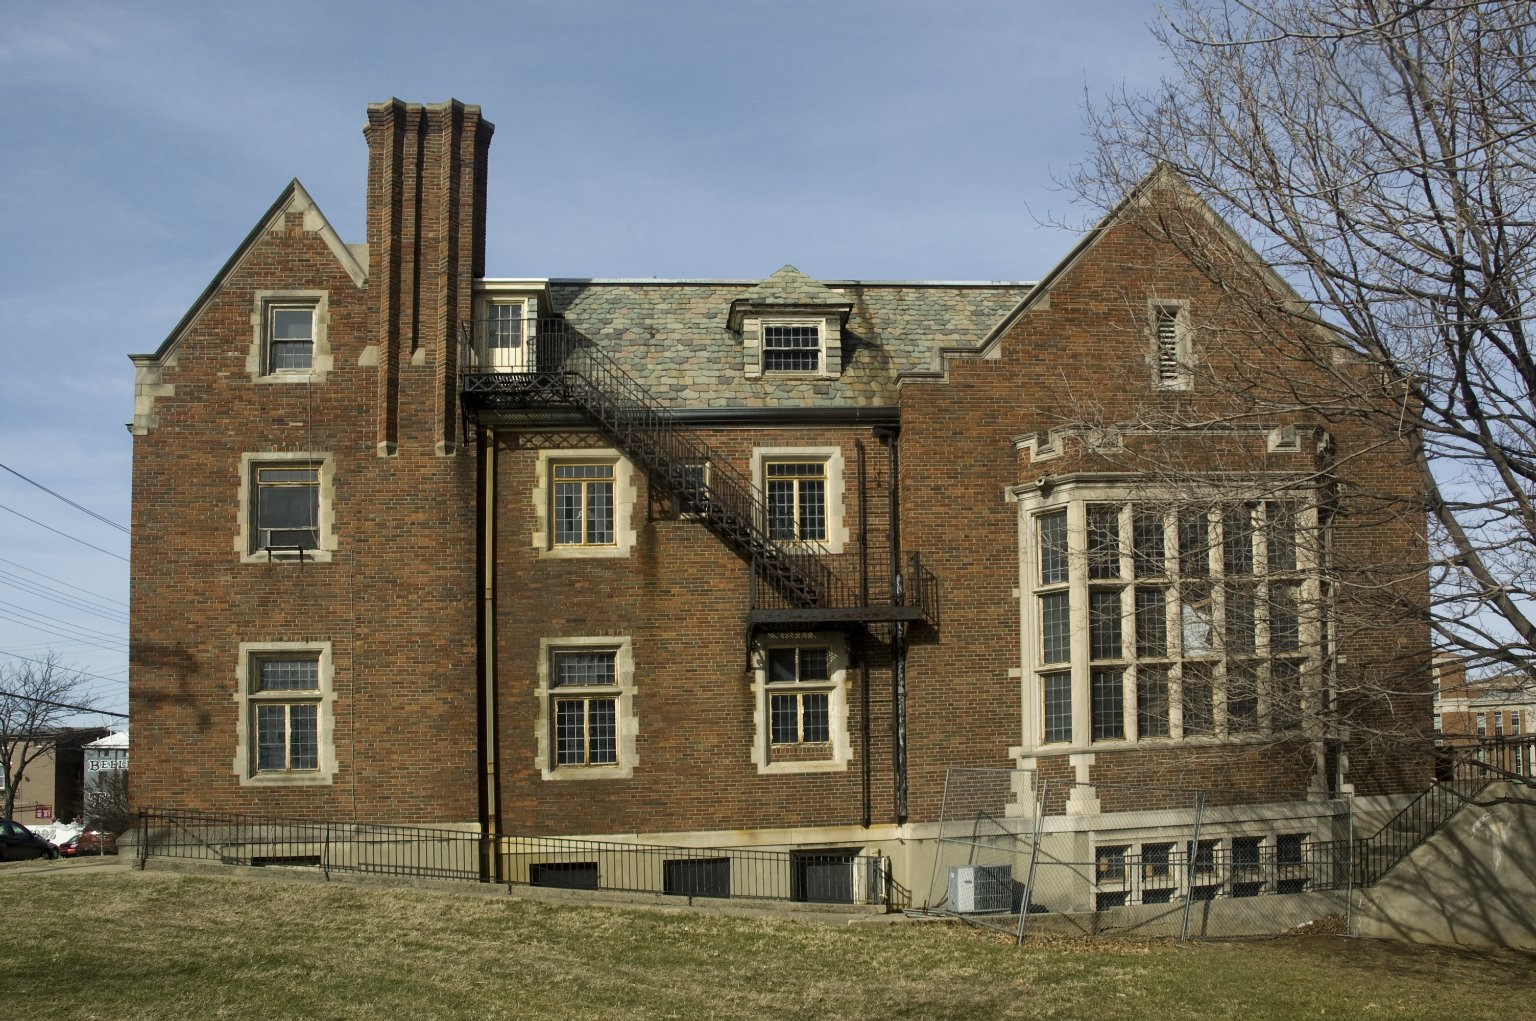 YMCA (University of Cincinnati)